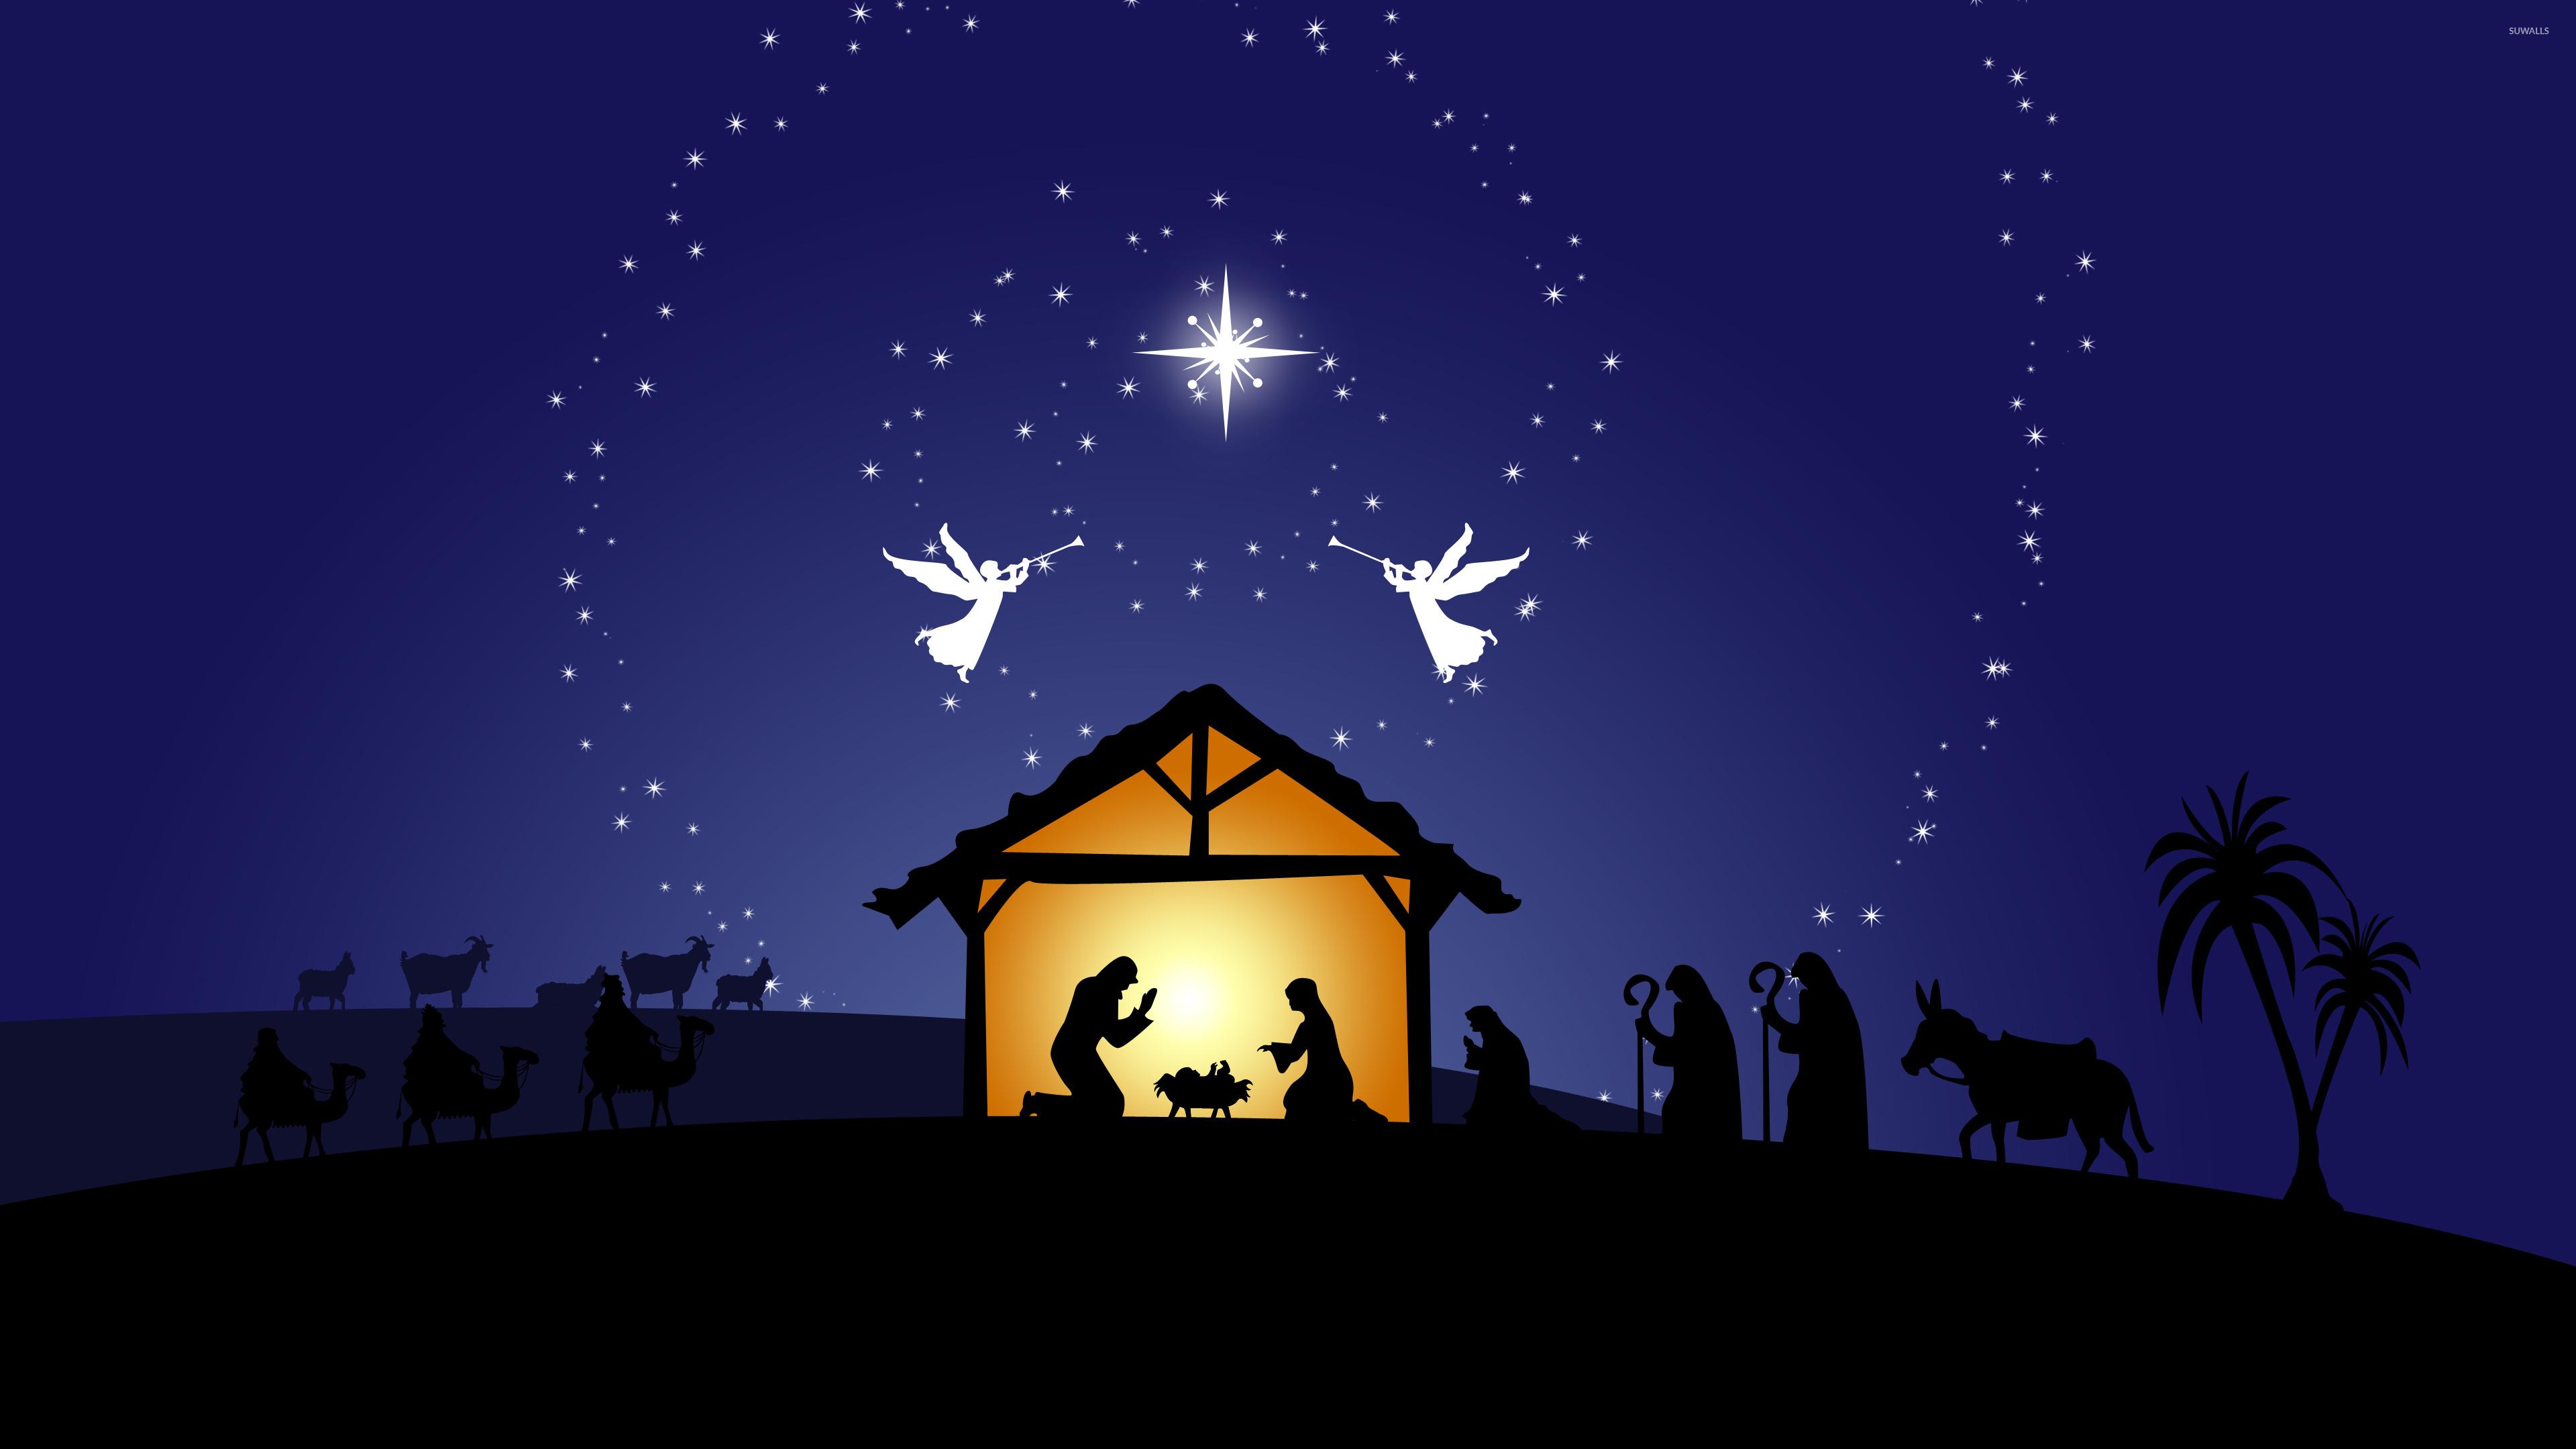 nativity scene wallpaper holiday wallpapers 50278 html code